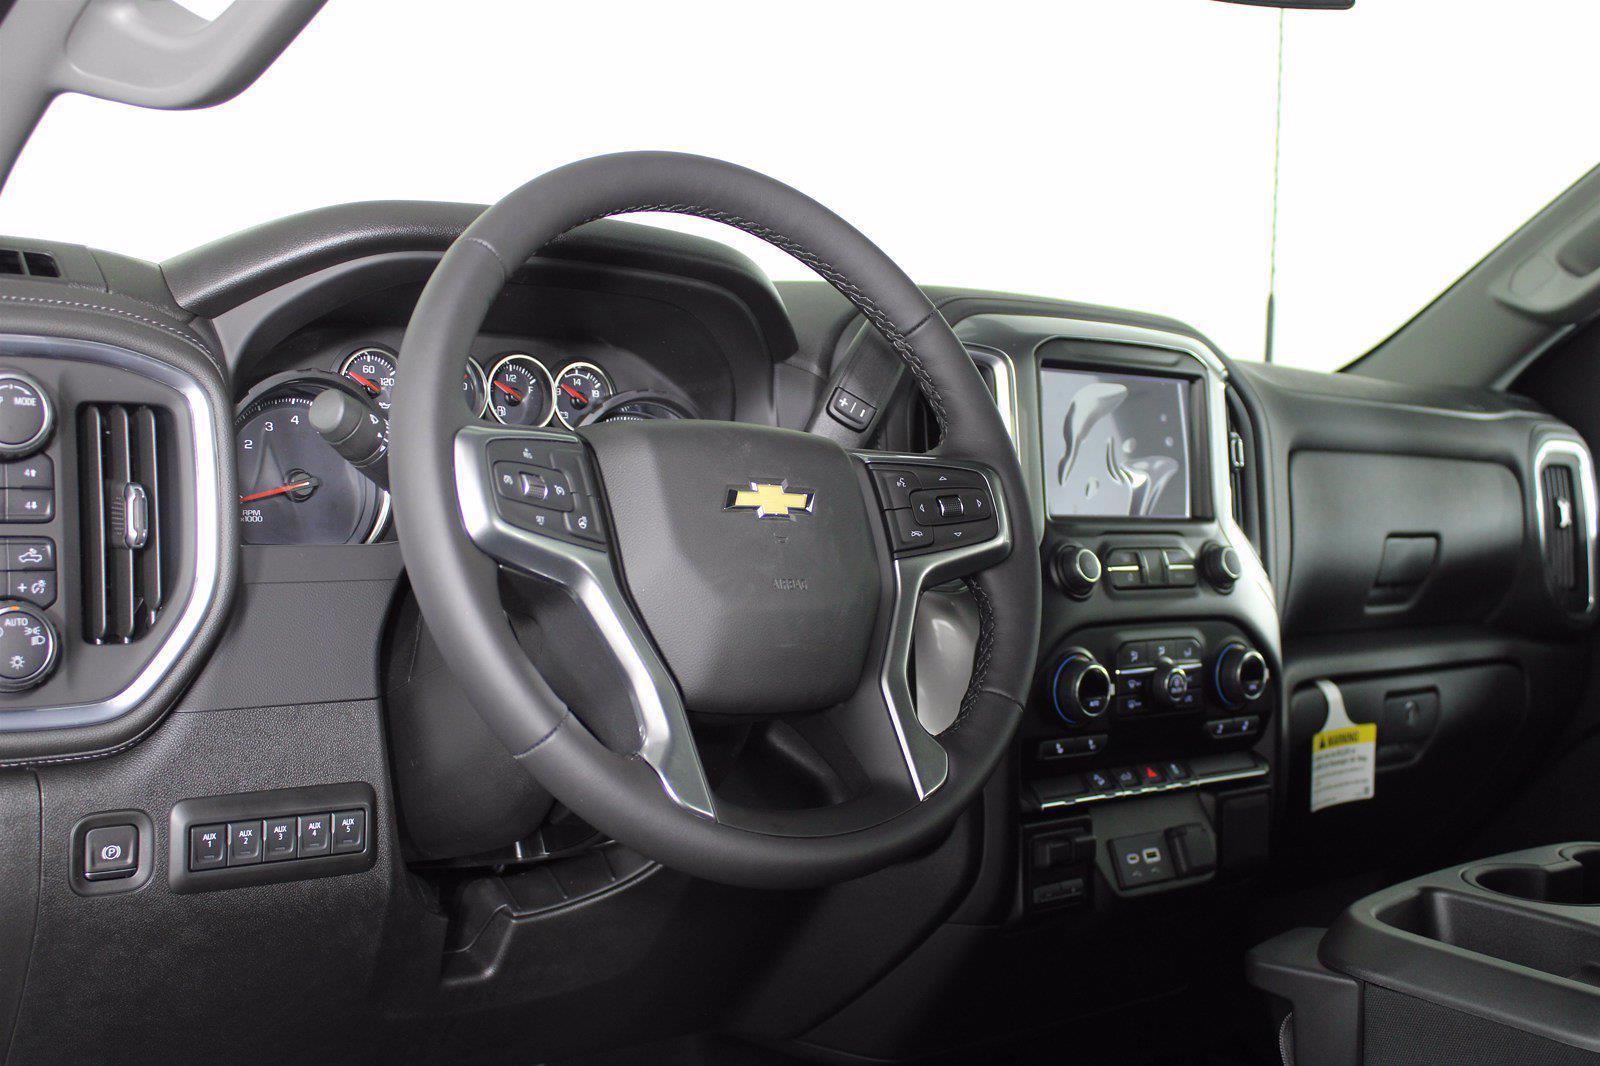 2022 Silverado 2500 Regular Cab 4x4,  Pickup #D120035 - photo 10